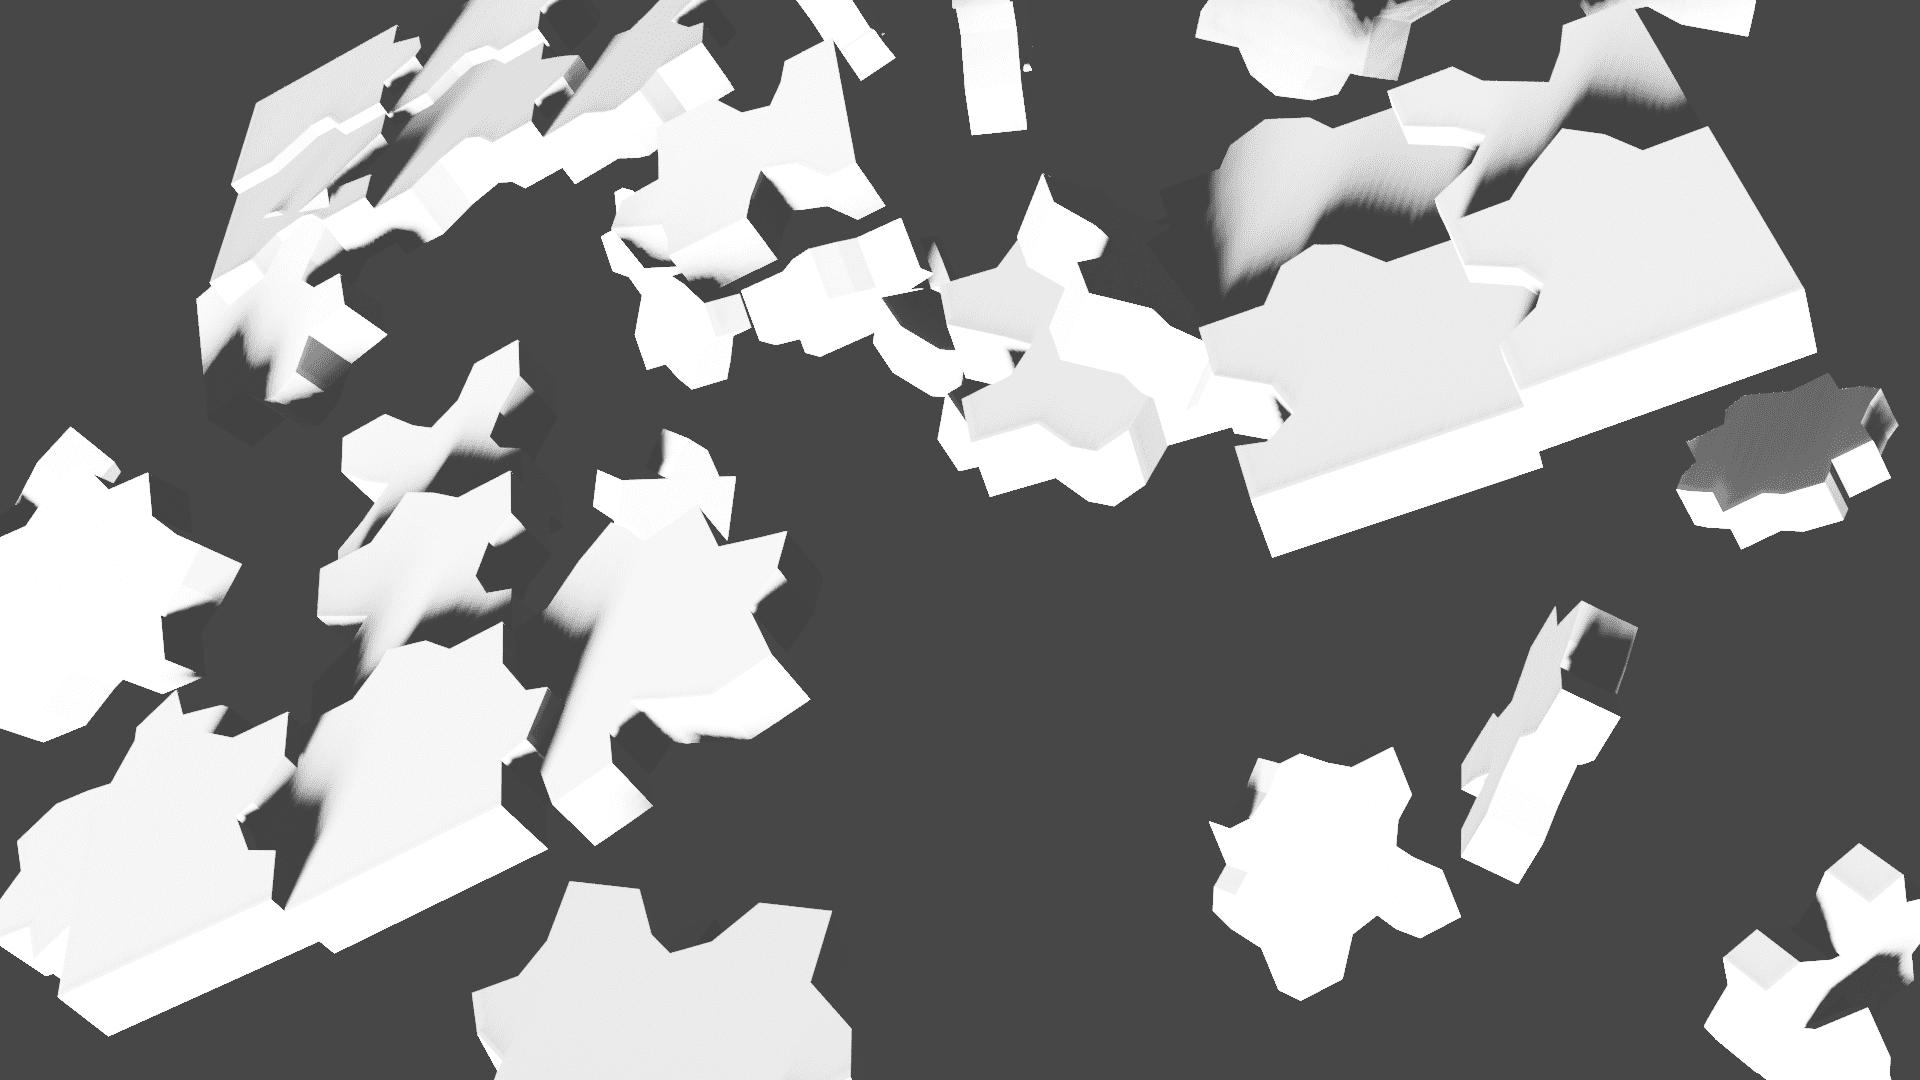 [Blender 2.8] 剛体の衝突や破壊表現 [リジッドボディ]